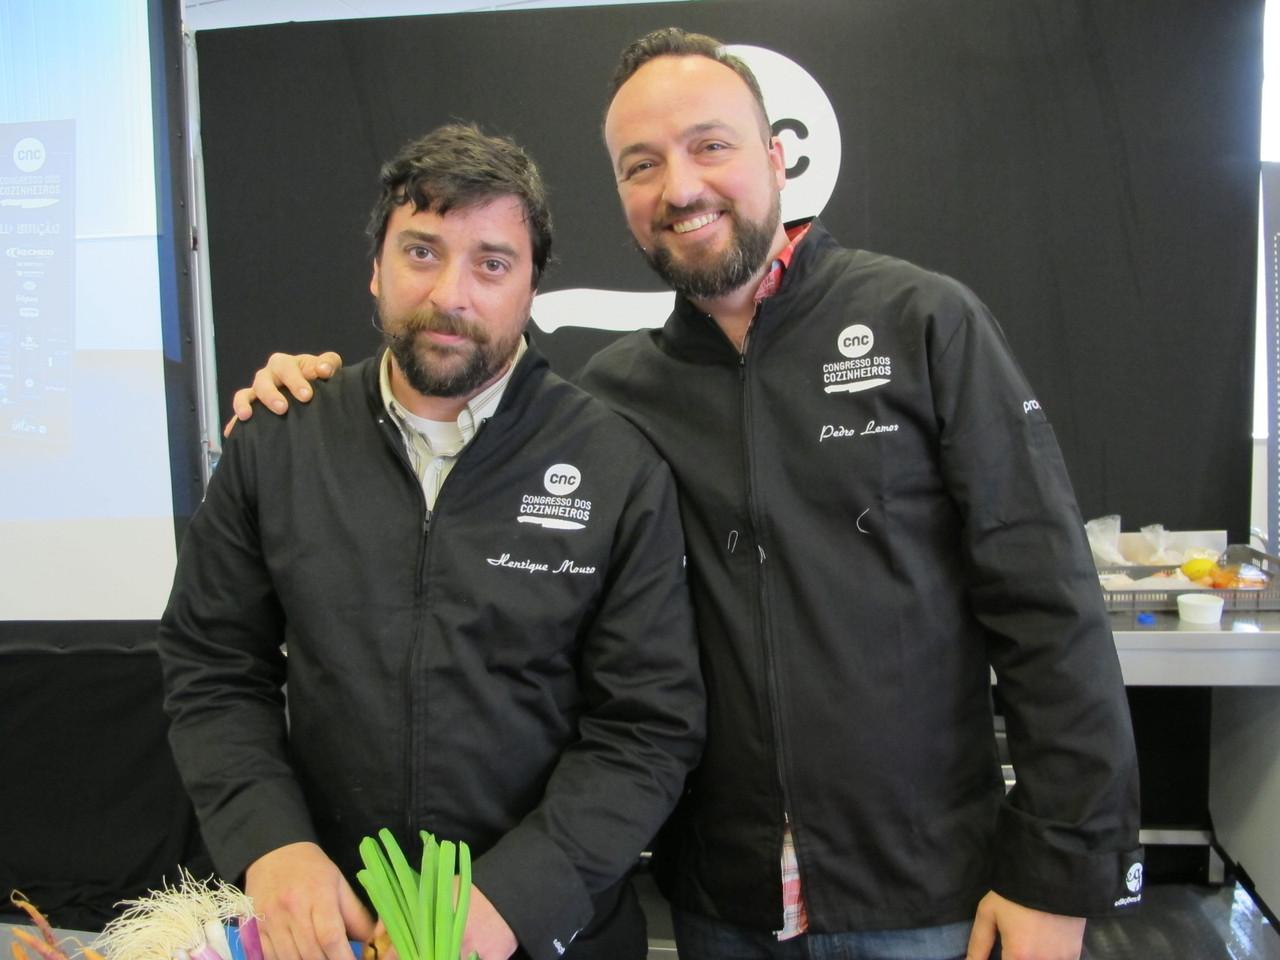 Henrique Mouro & Pedro Lemos